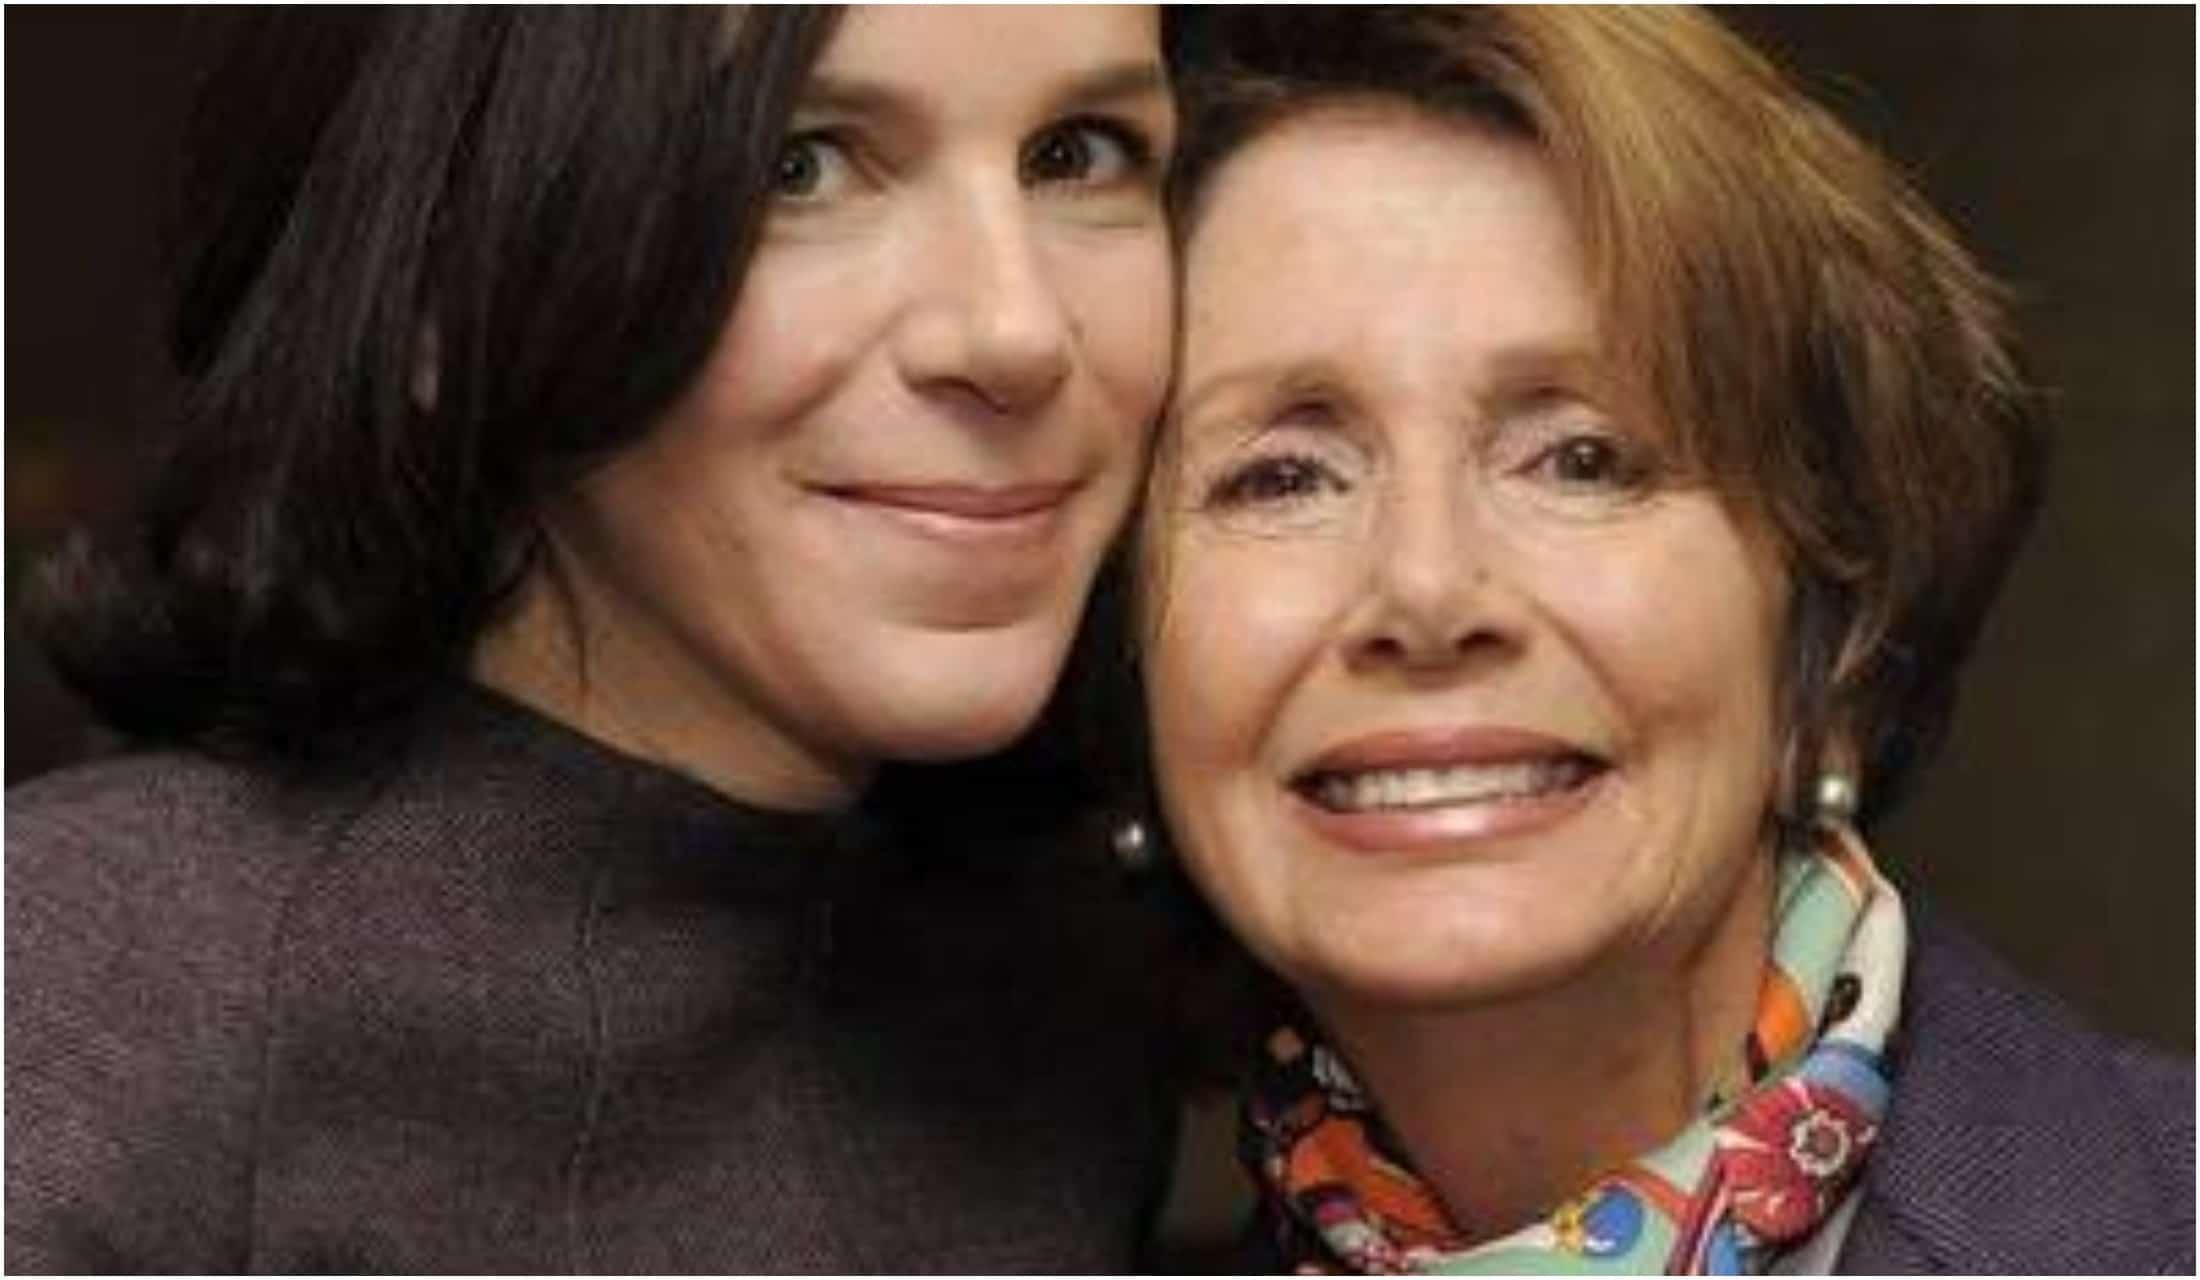 Jacqueline Pelosi's biography, net worth